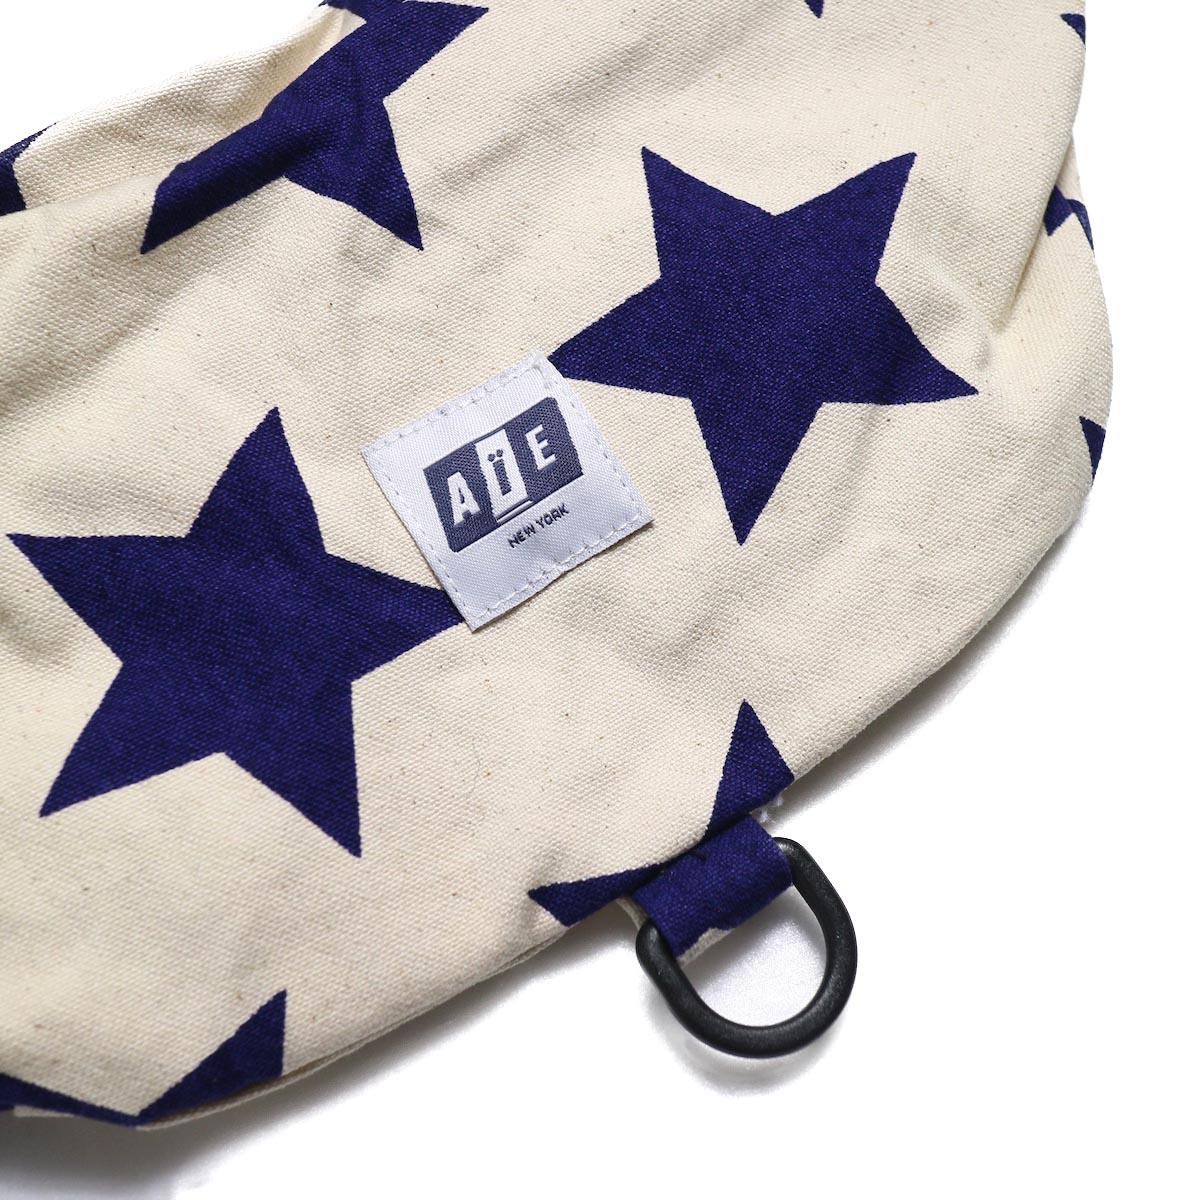 AiE / Waist Pouch -9oz Star Canvas (Natural/Navy)